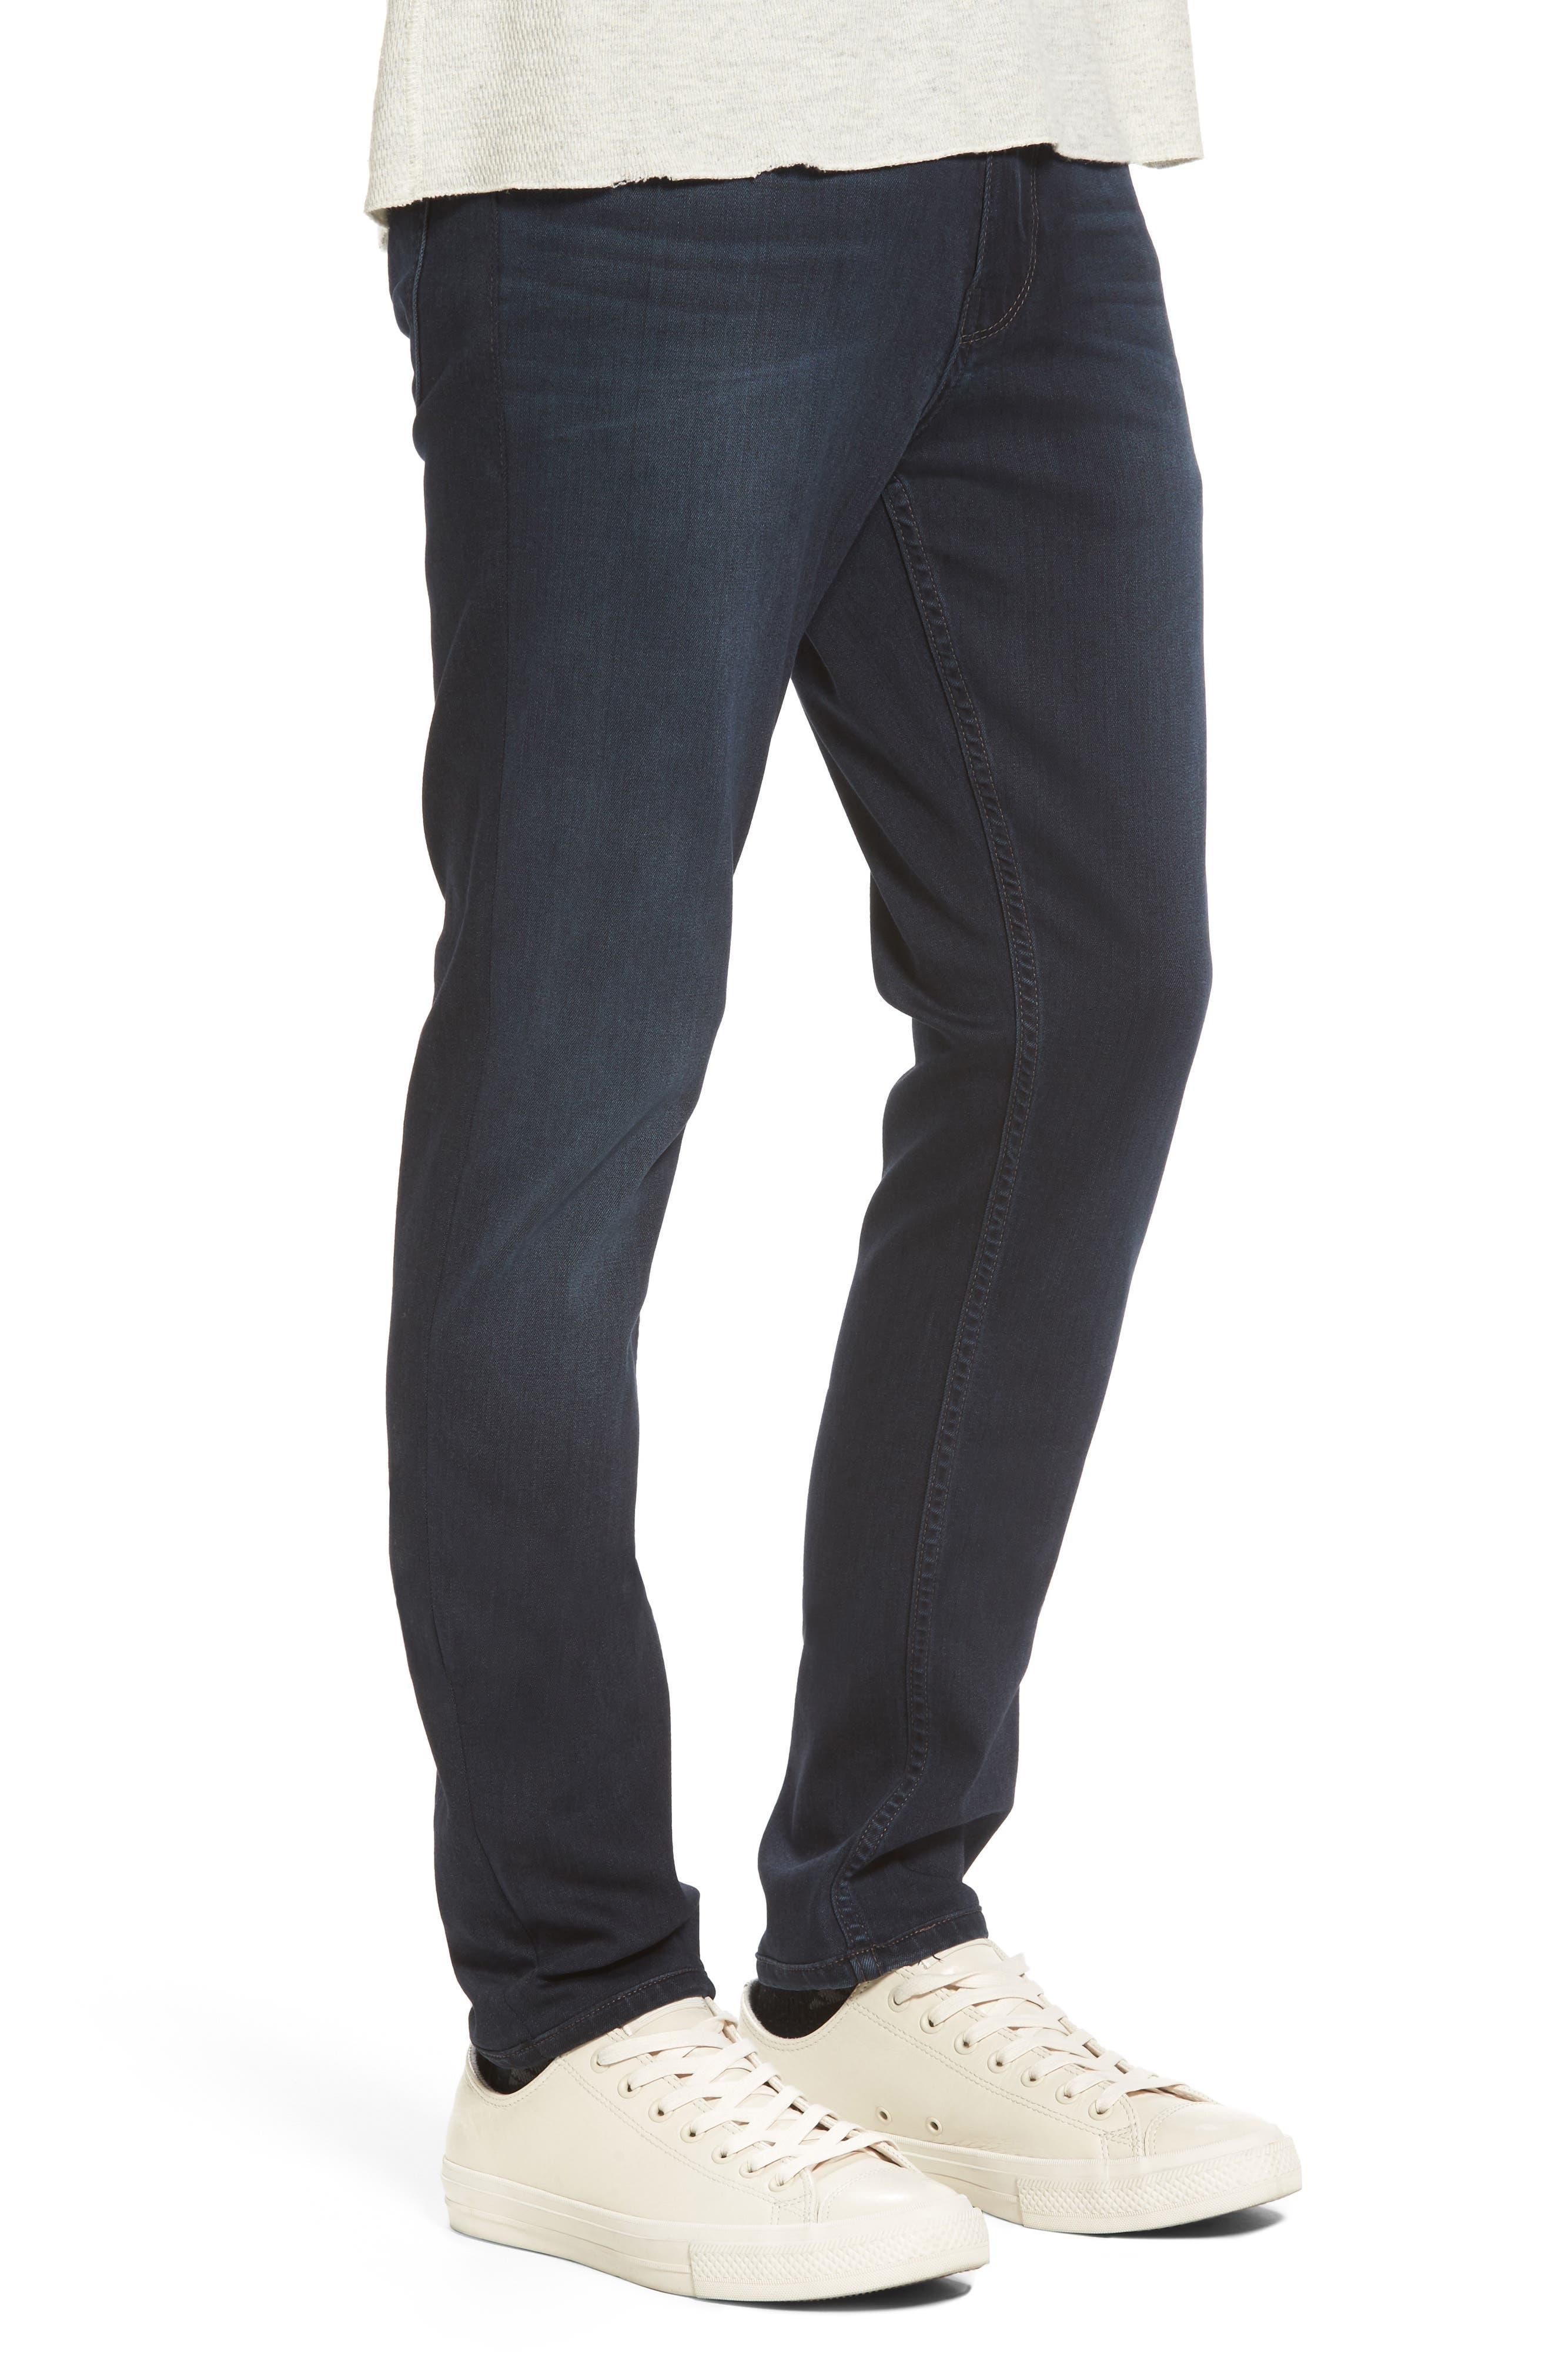 Croft Skinny Fit Jeans,                             Alternate thumbnail 3, color,                             400